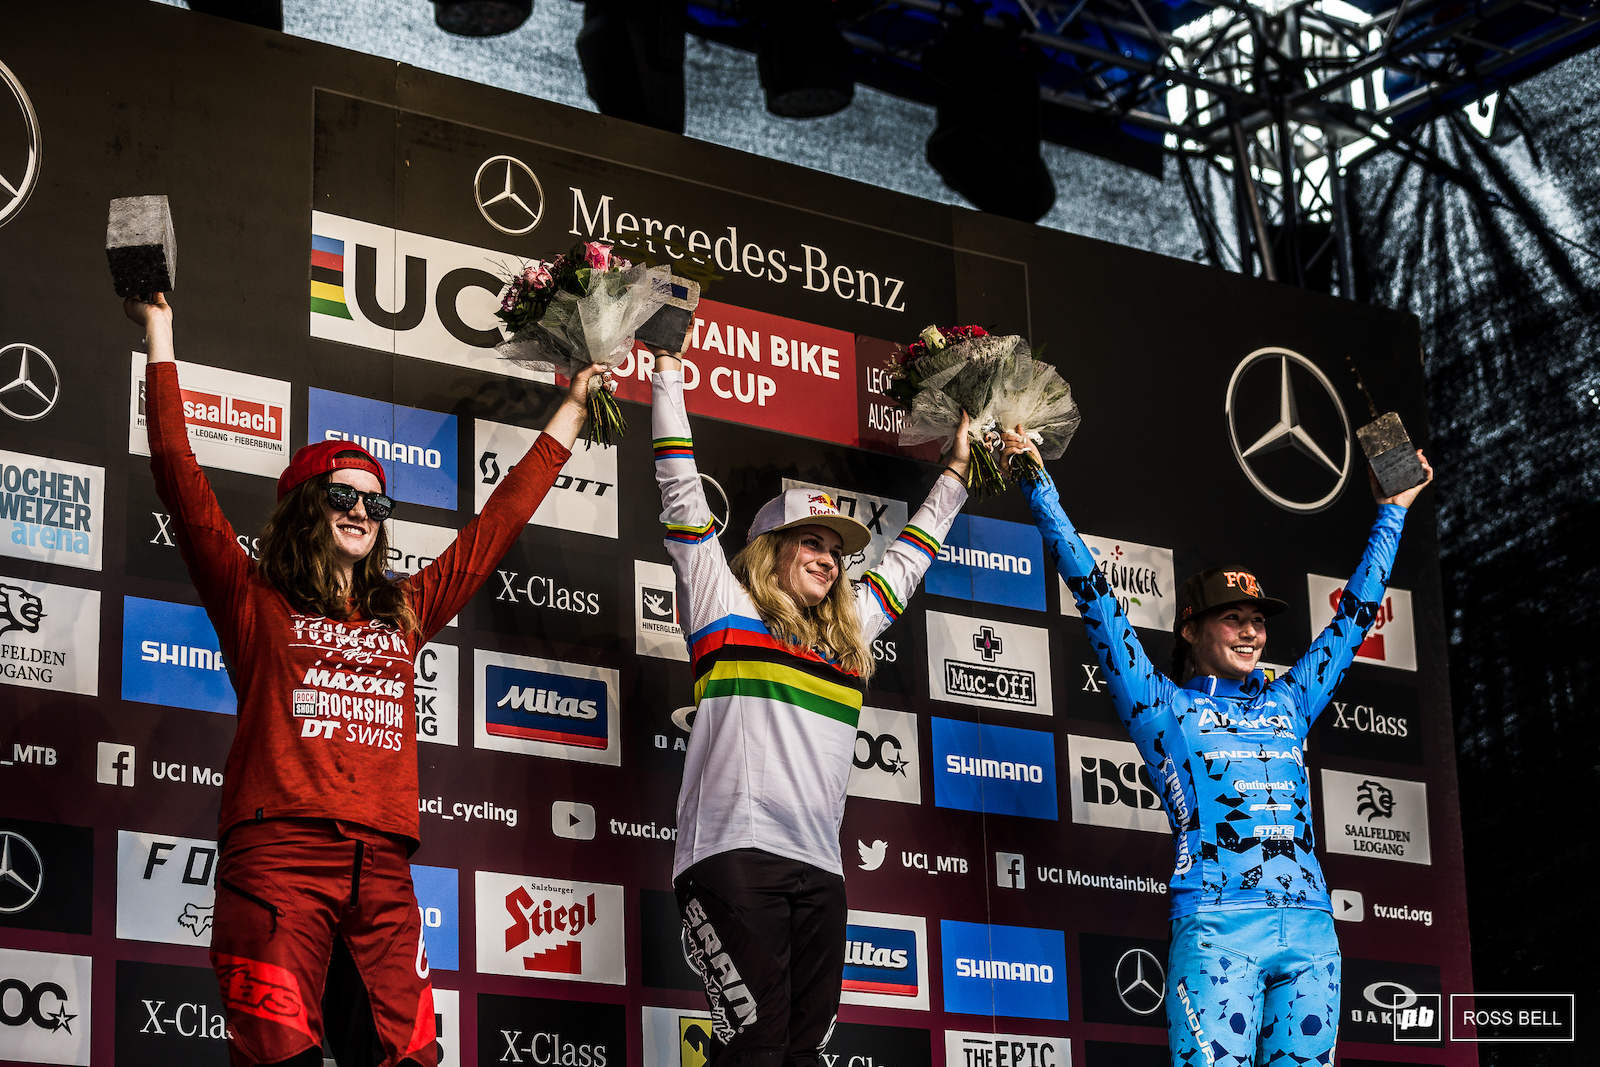 Your top 3 Junior Women. 1st Vali Holl 2nd Anna Newkirk 3rd Mille Johnset